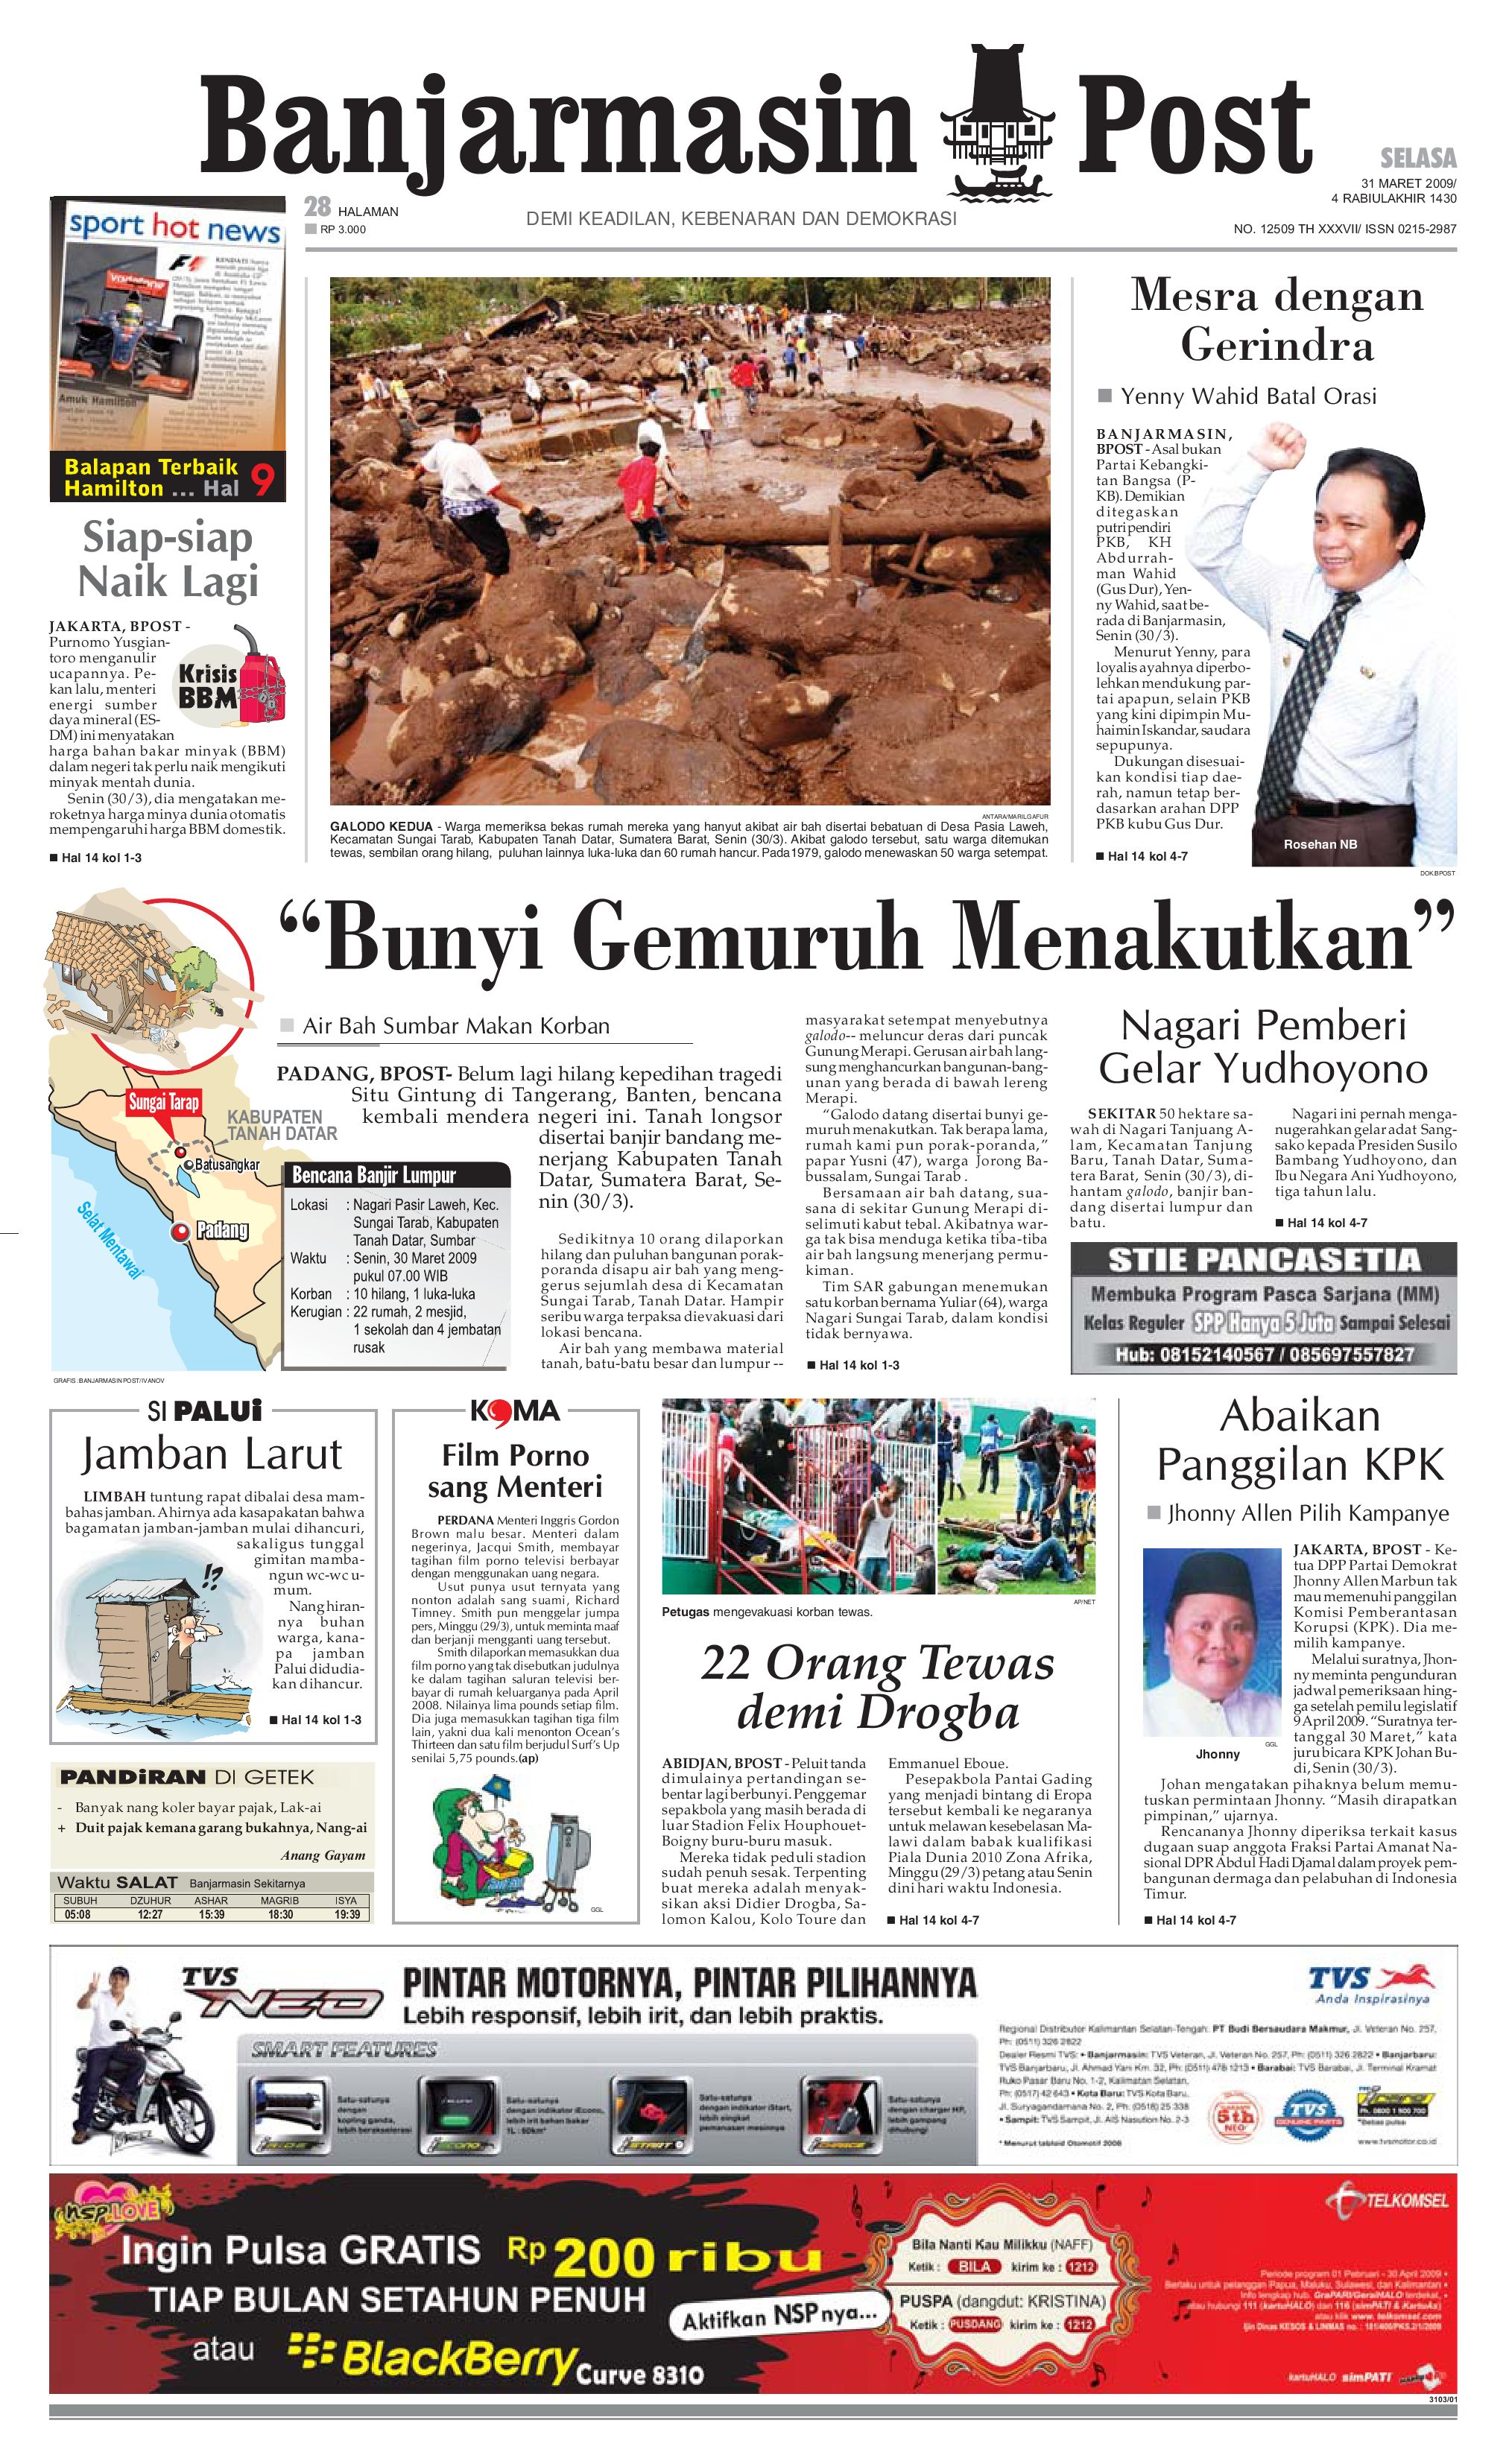 Banjarmasin Post 27 Februari 2009 By Issuu Rejeki Tcash Voucher Mcdonaldamp039s Rp 300000 31maret